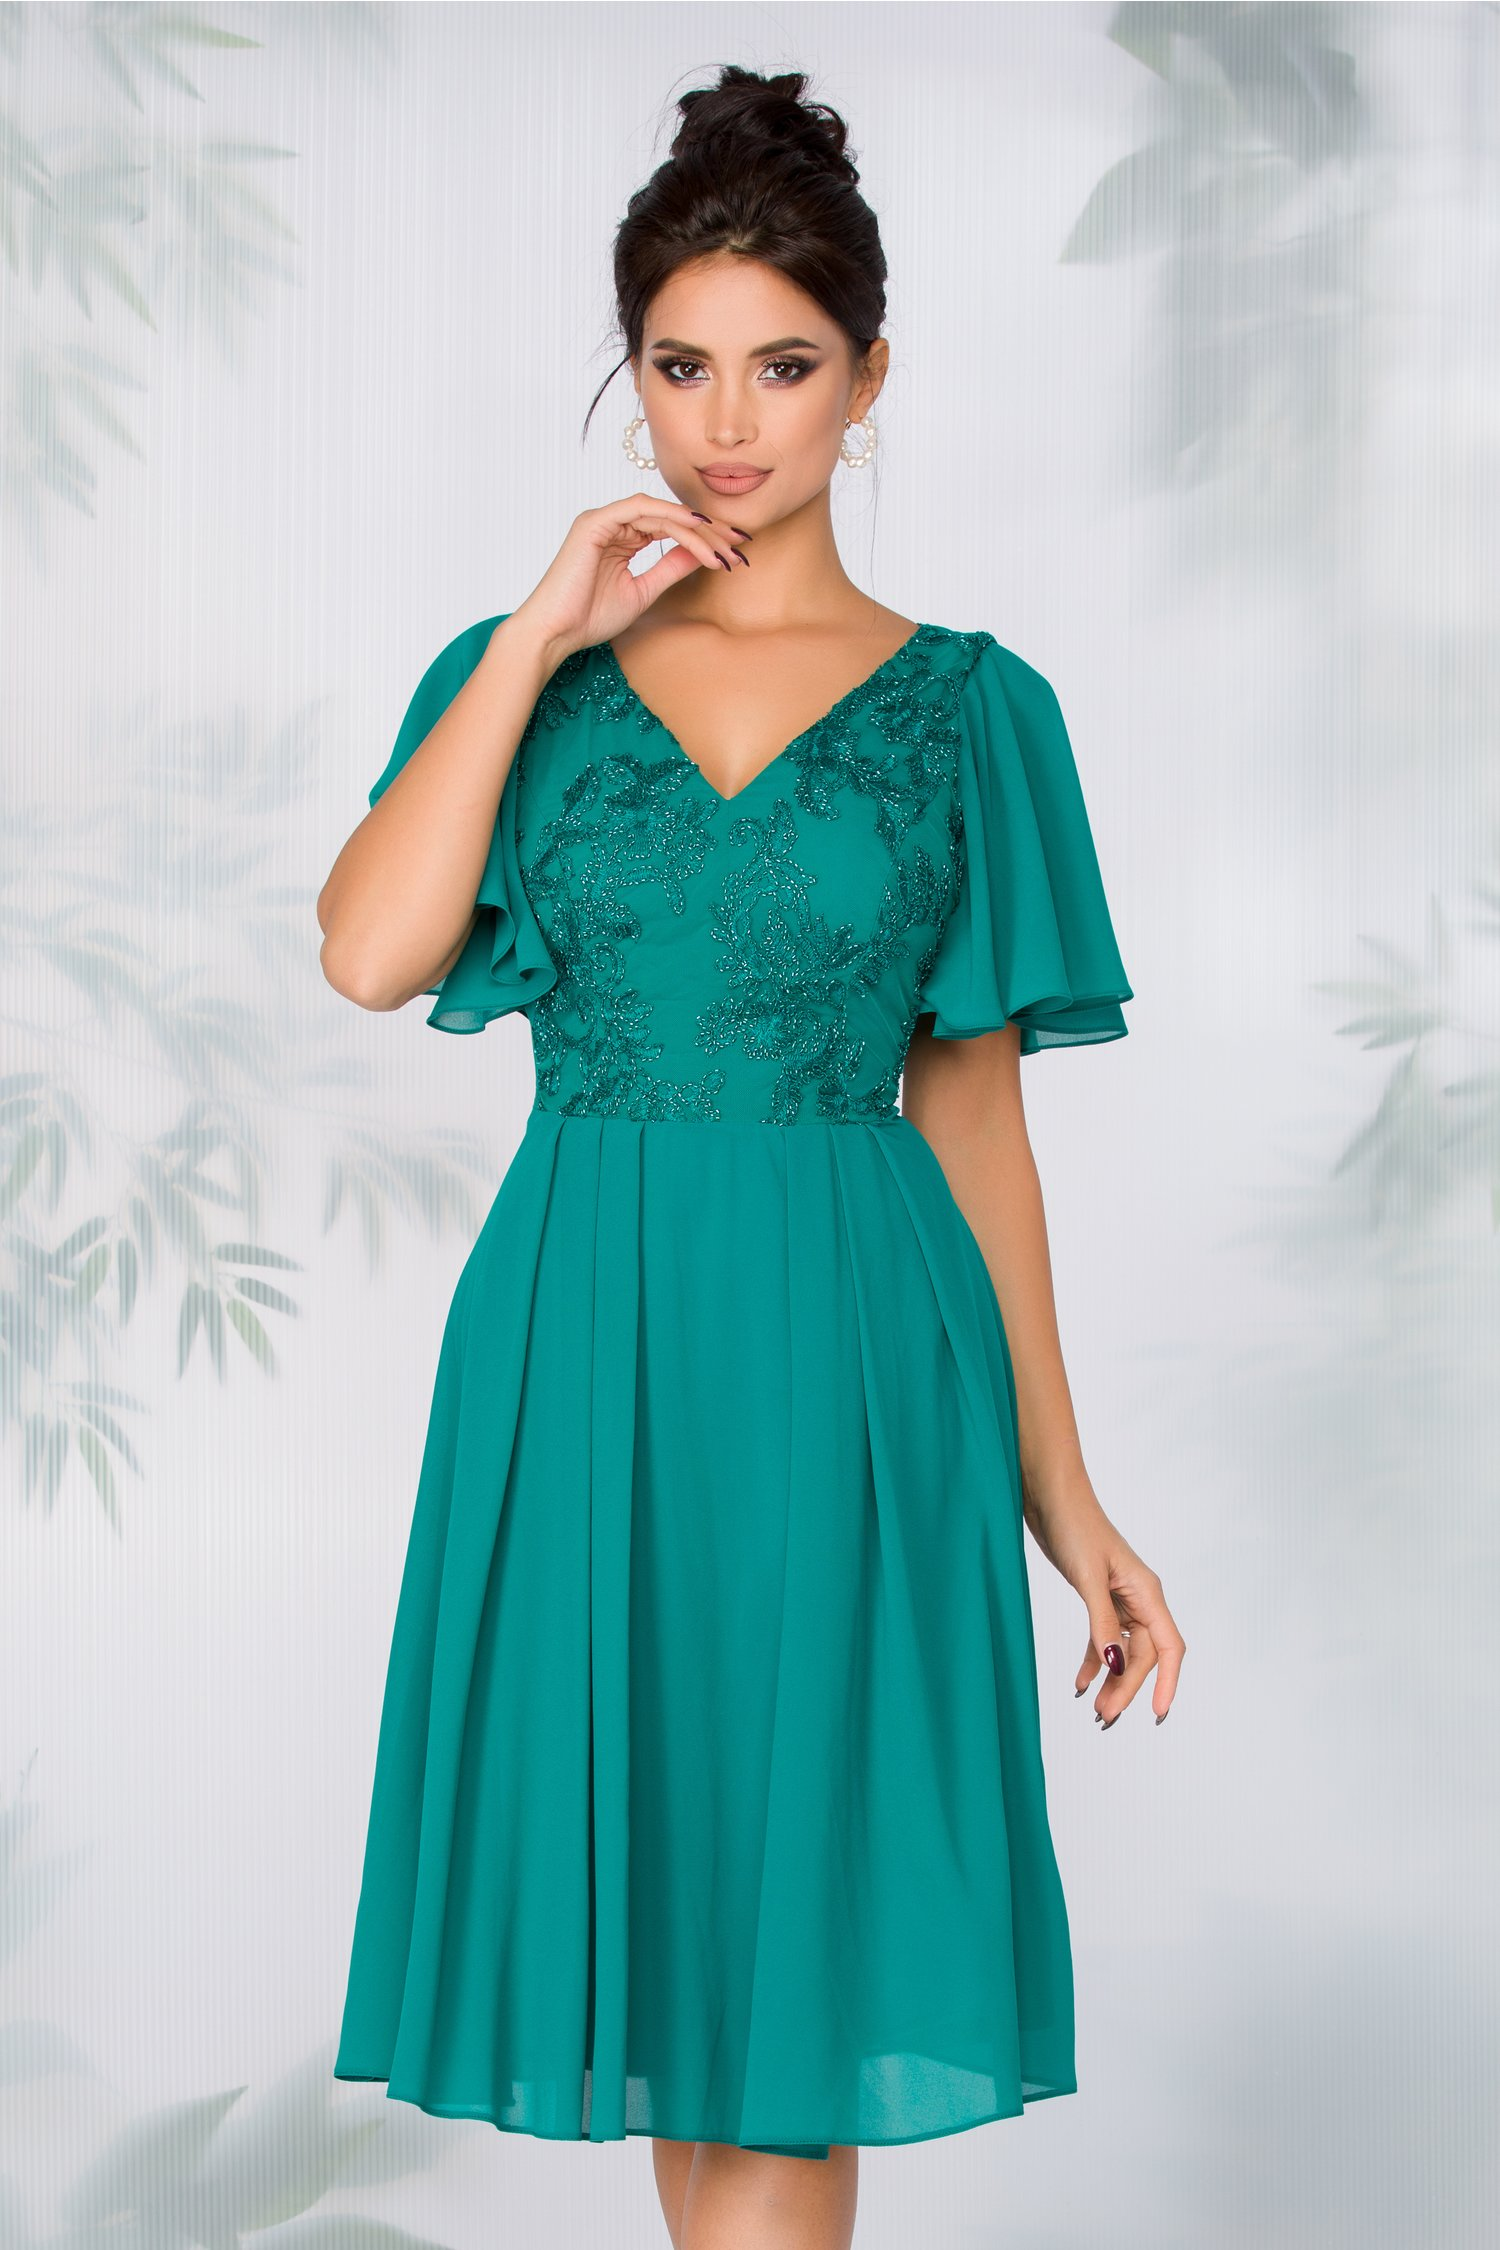 Rochie Anastasia verde din voal cu broderie florala la bust si margelute